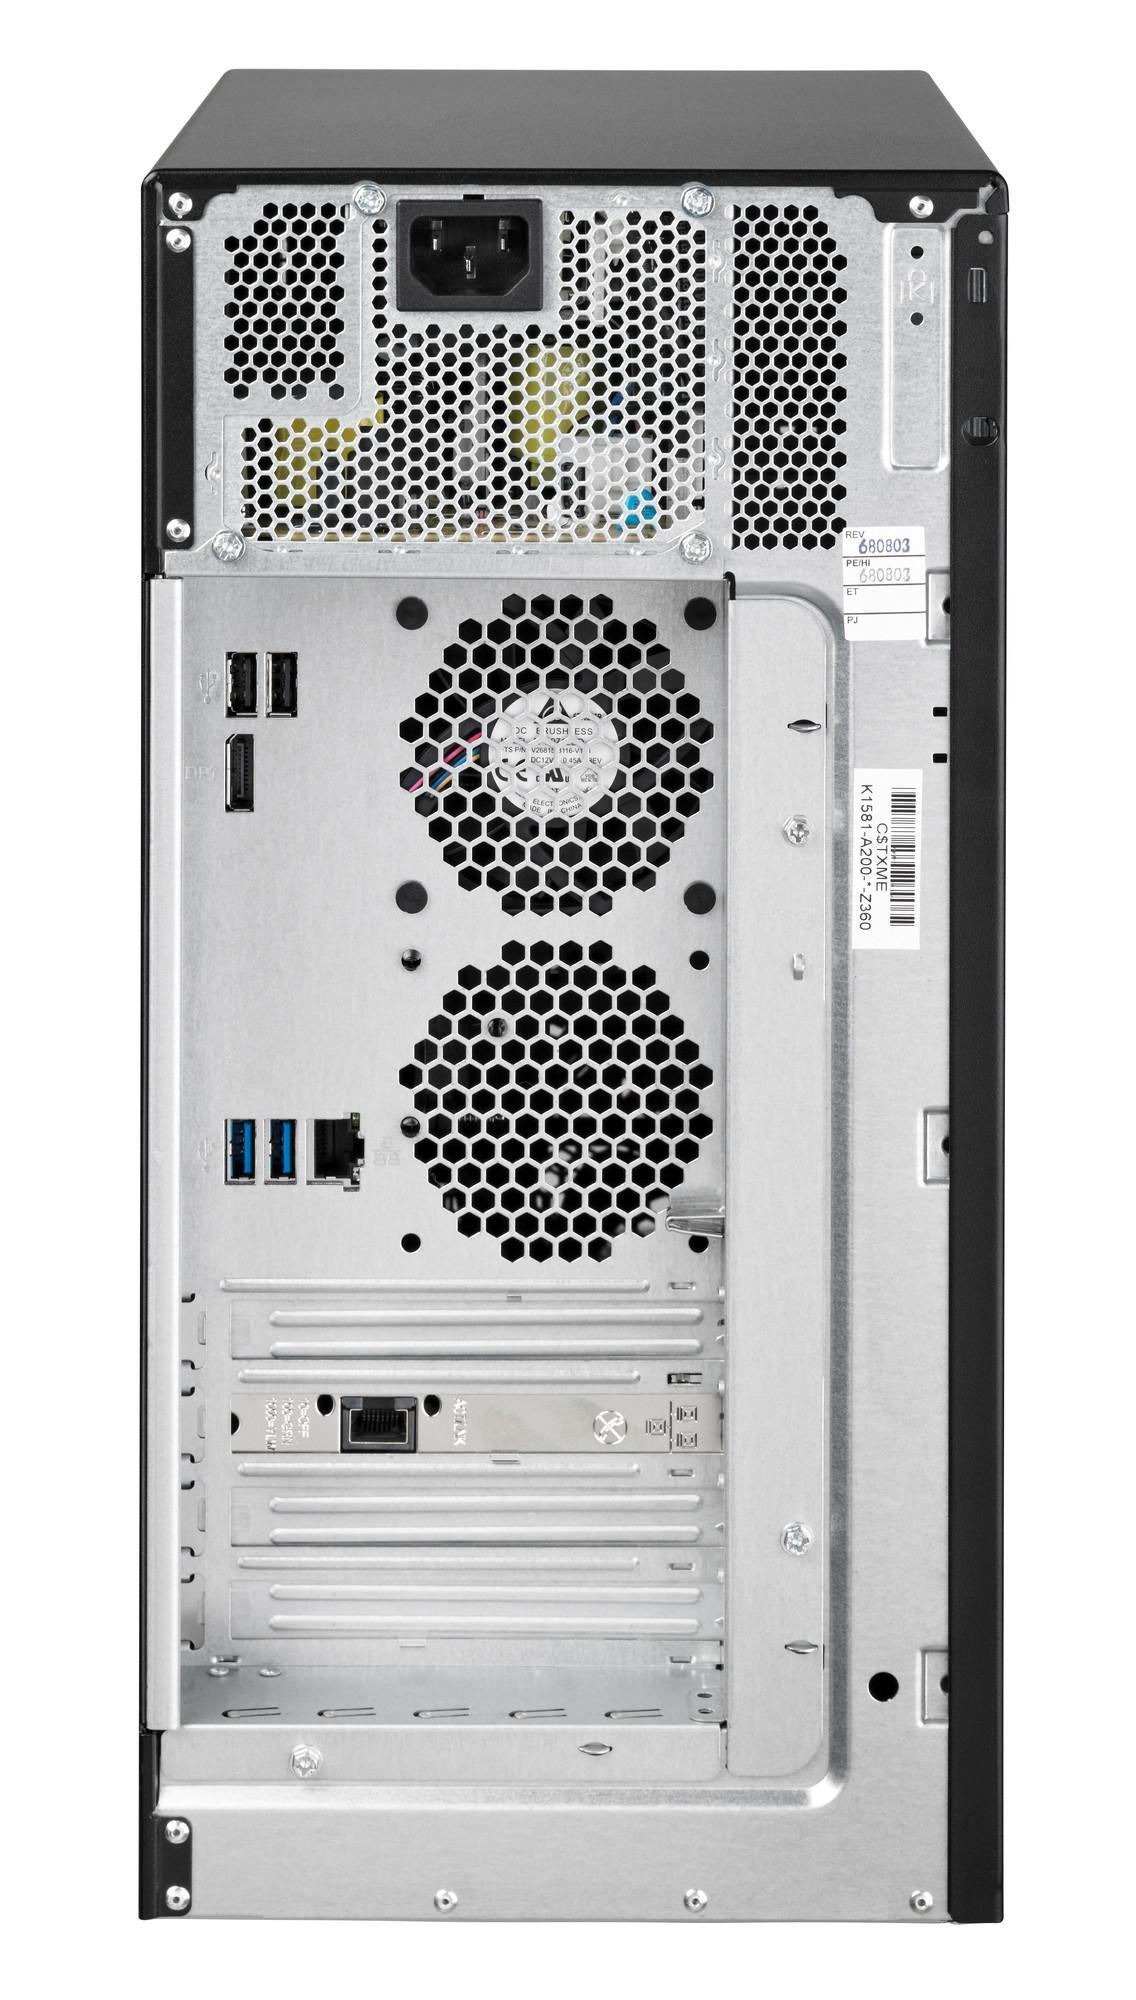 Сървър Fujitsu Primergy TX1310 M3 Xeon E3-1225v6/8Gb/2x1000GB/DVDRW / Standart PSU 250W/85%